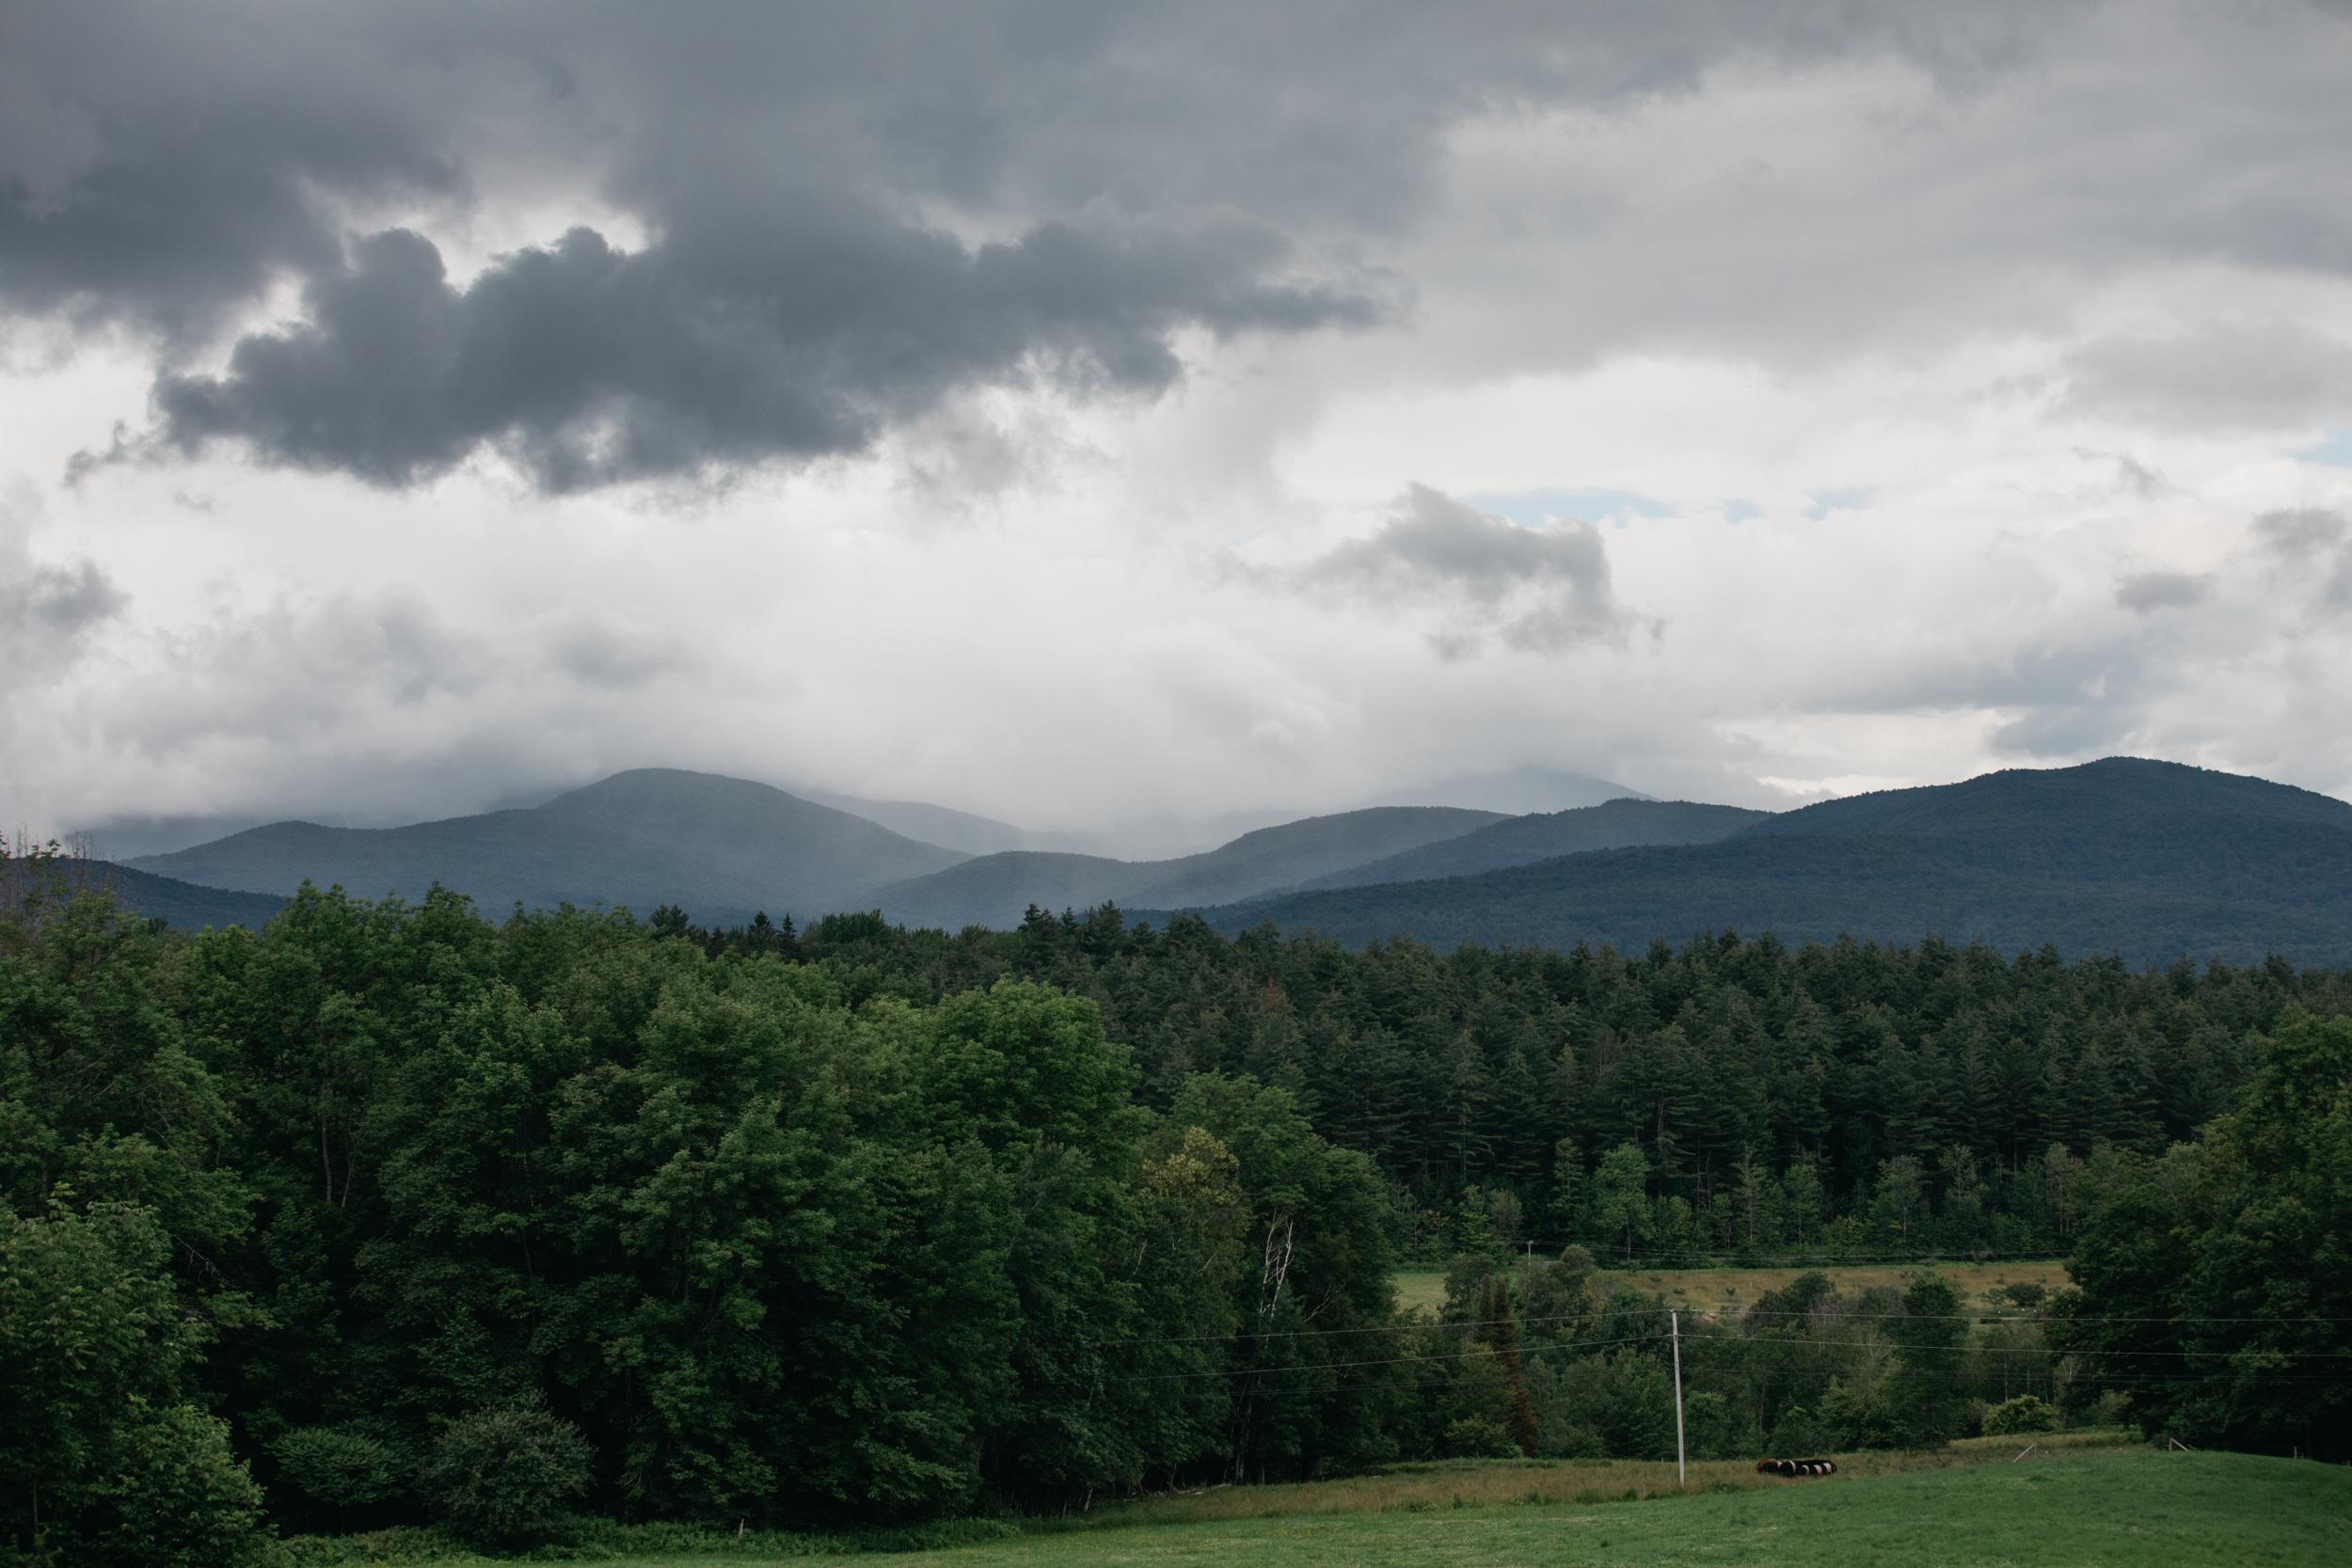 Karen_Alex_Bliss_ridge_farm_Vermont_wedding014.jpg